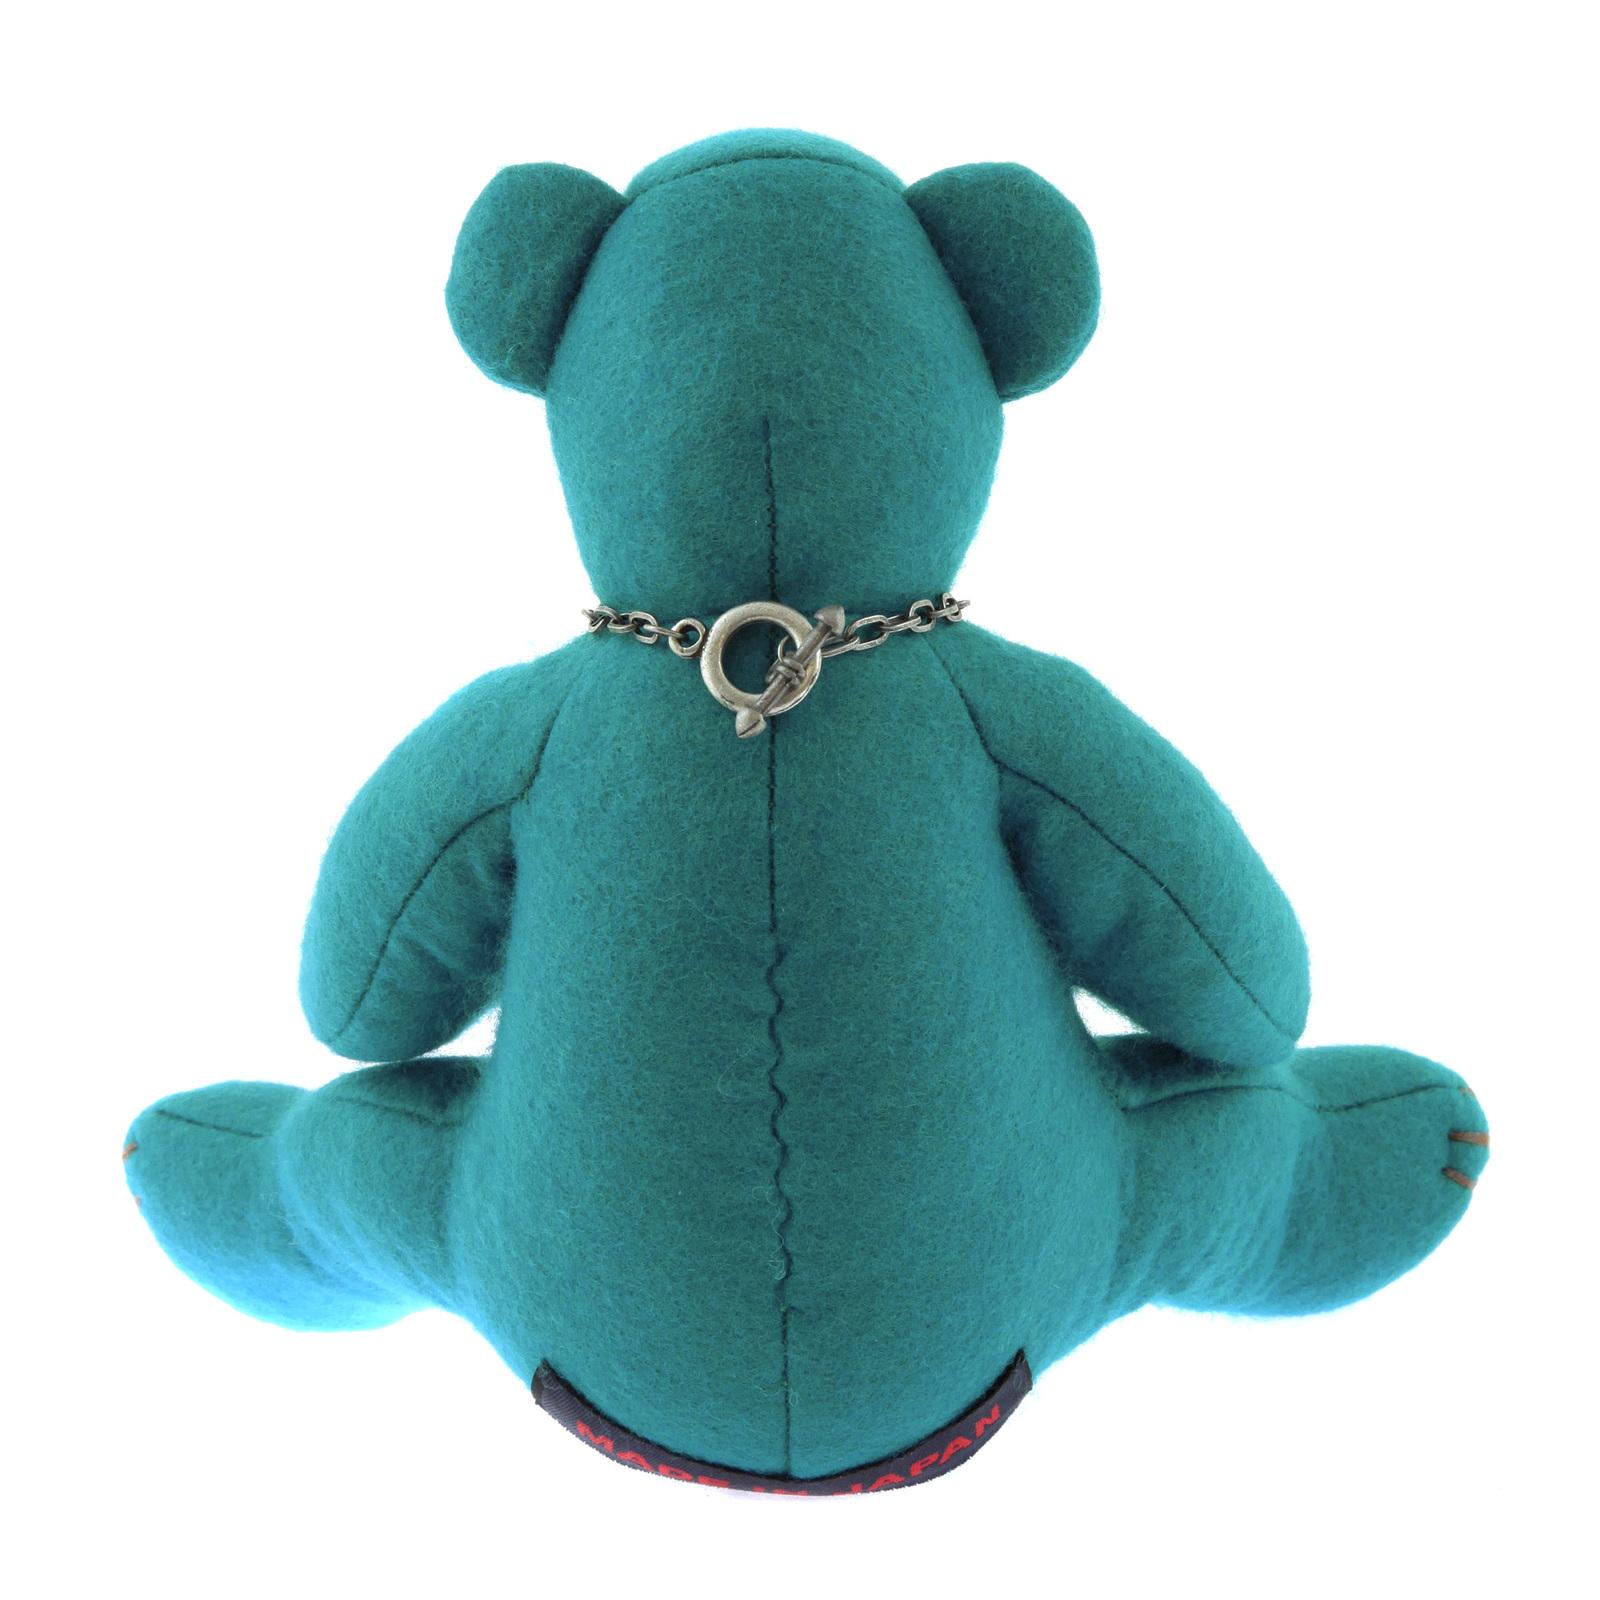 Yoropiko Limited Edition Teddy Bear, Fun Gifts for Guys